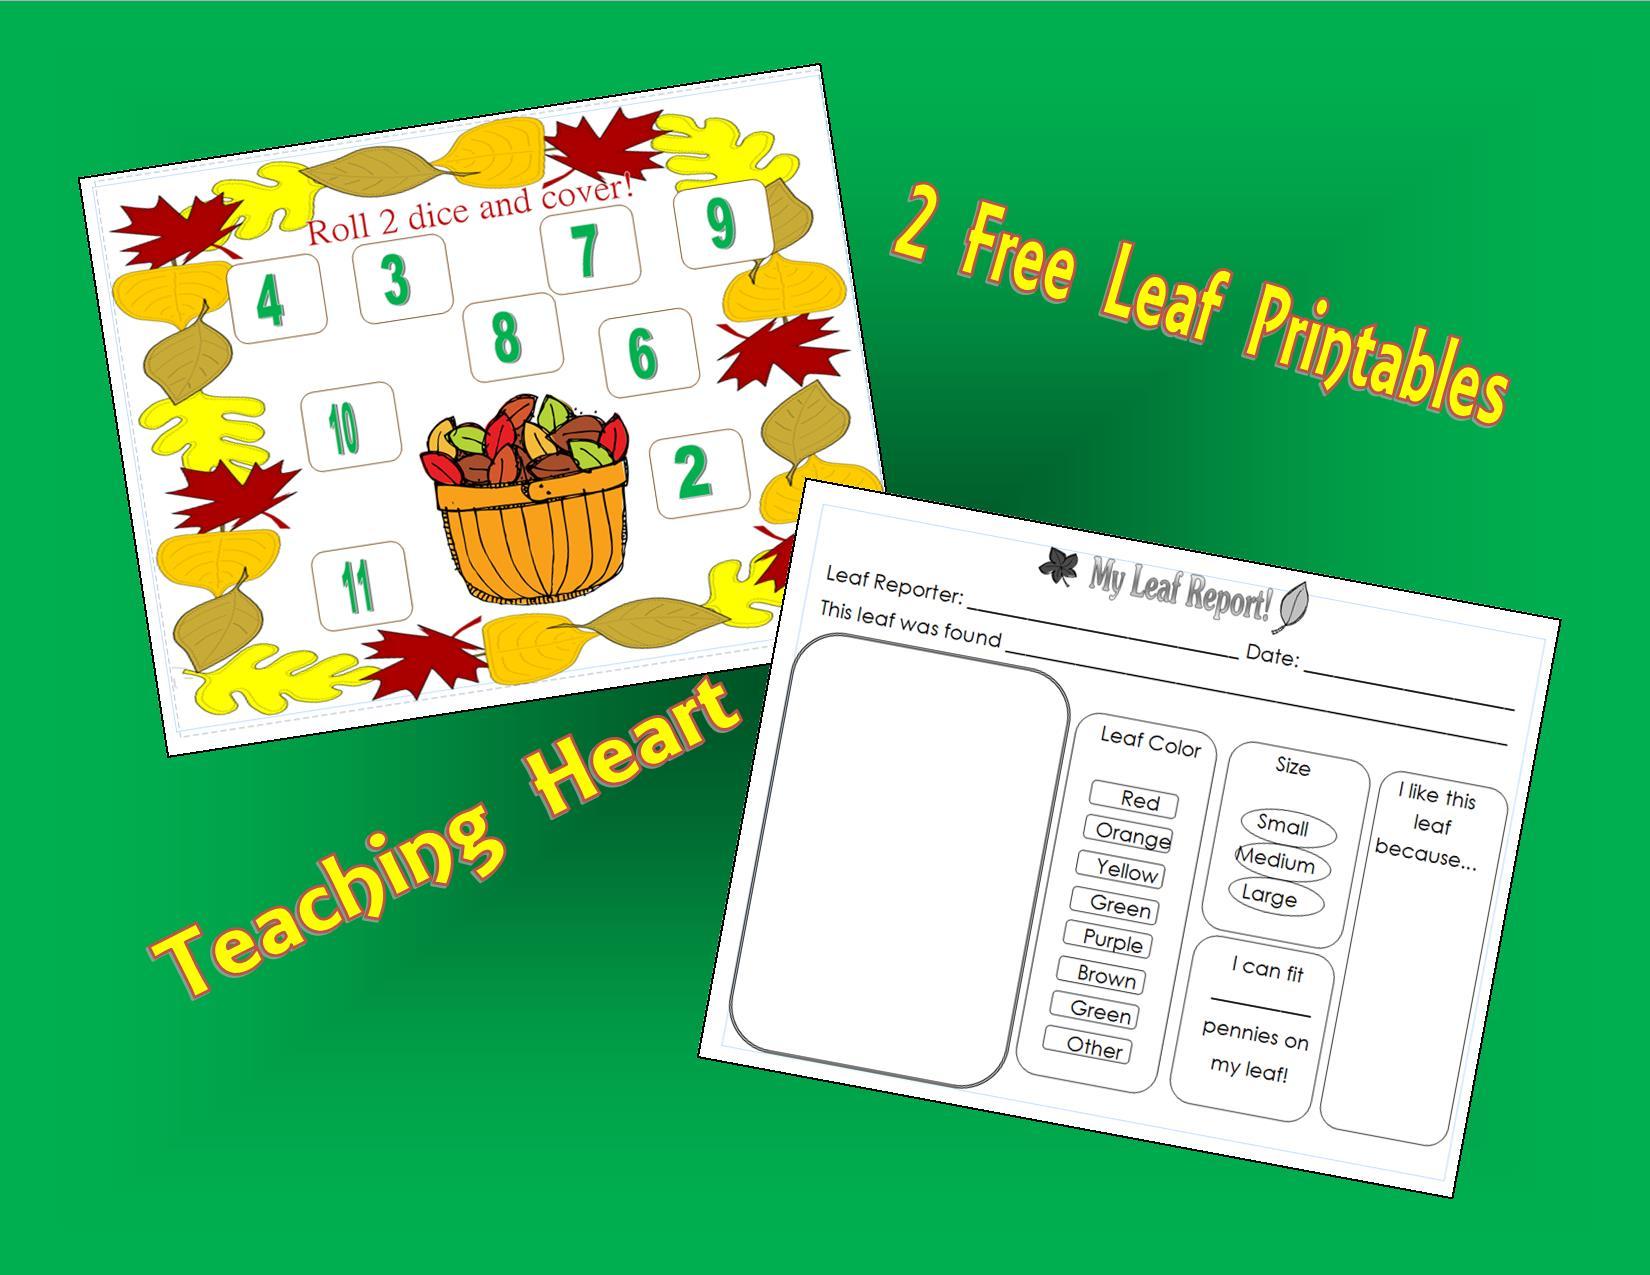 Free Leaf Printables Teaching Heart Blog